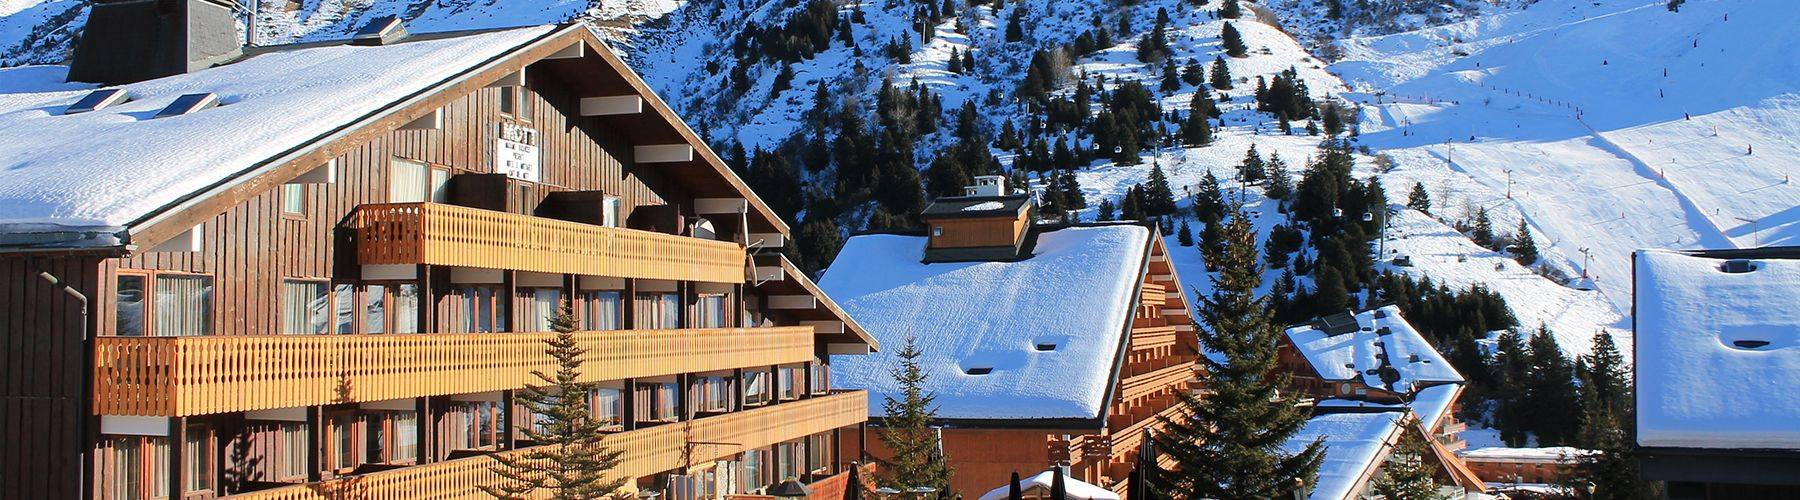 Madame Vacances Hotel Le Mottaret